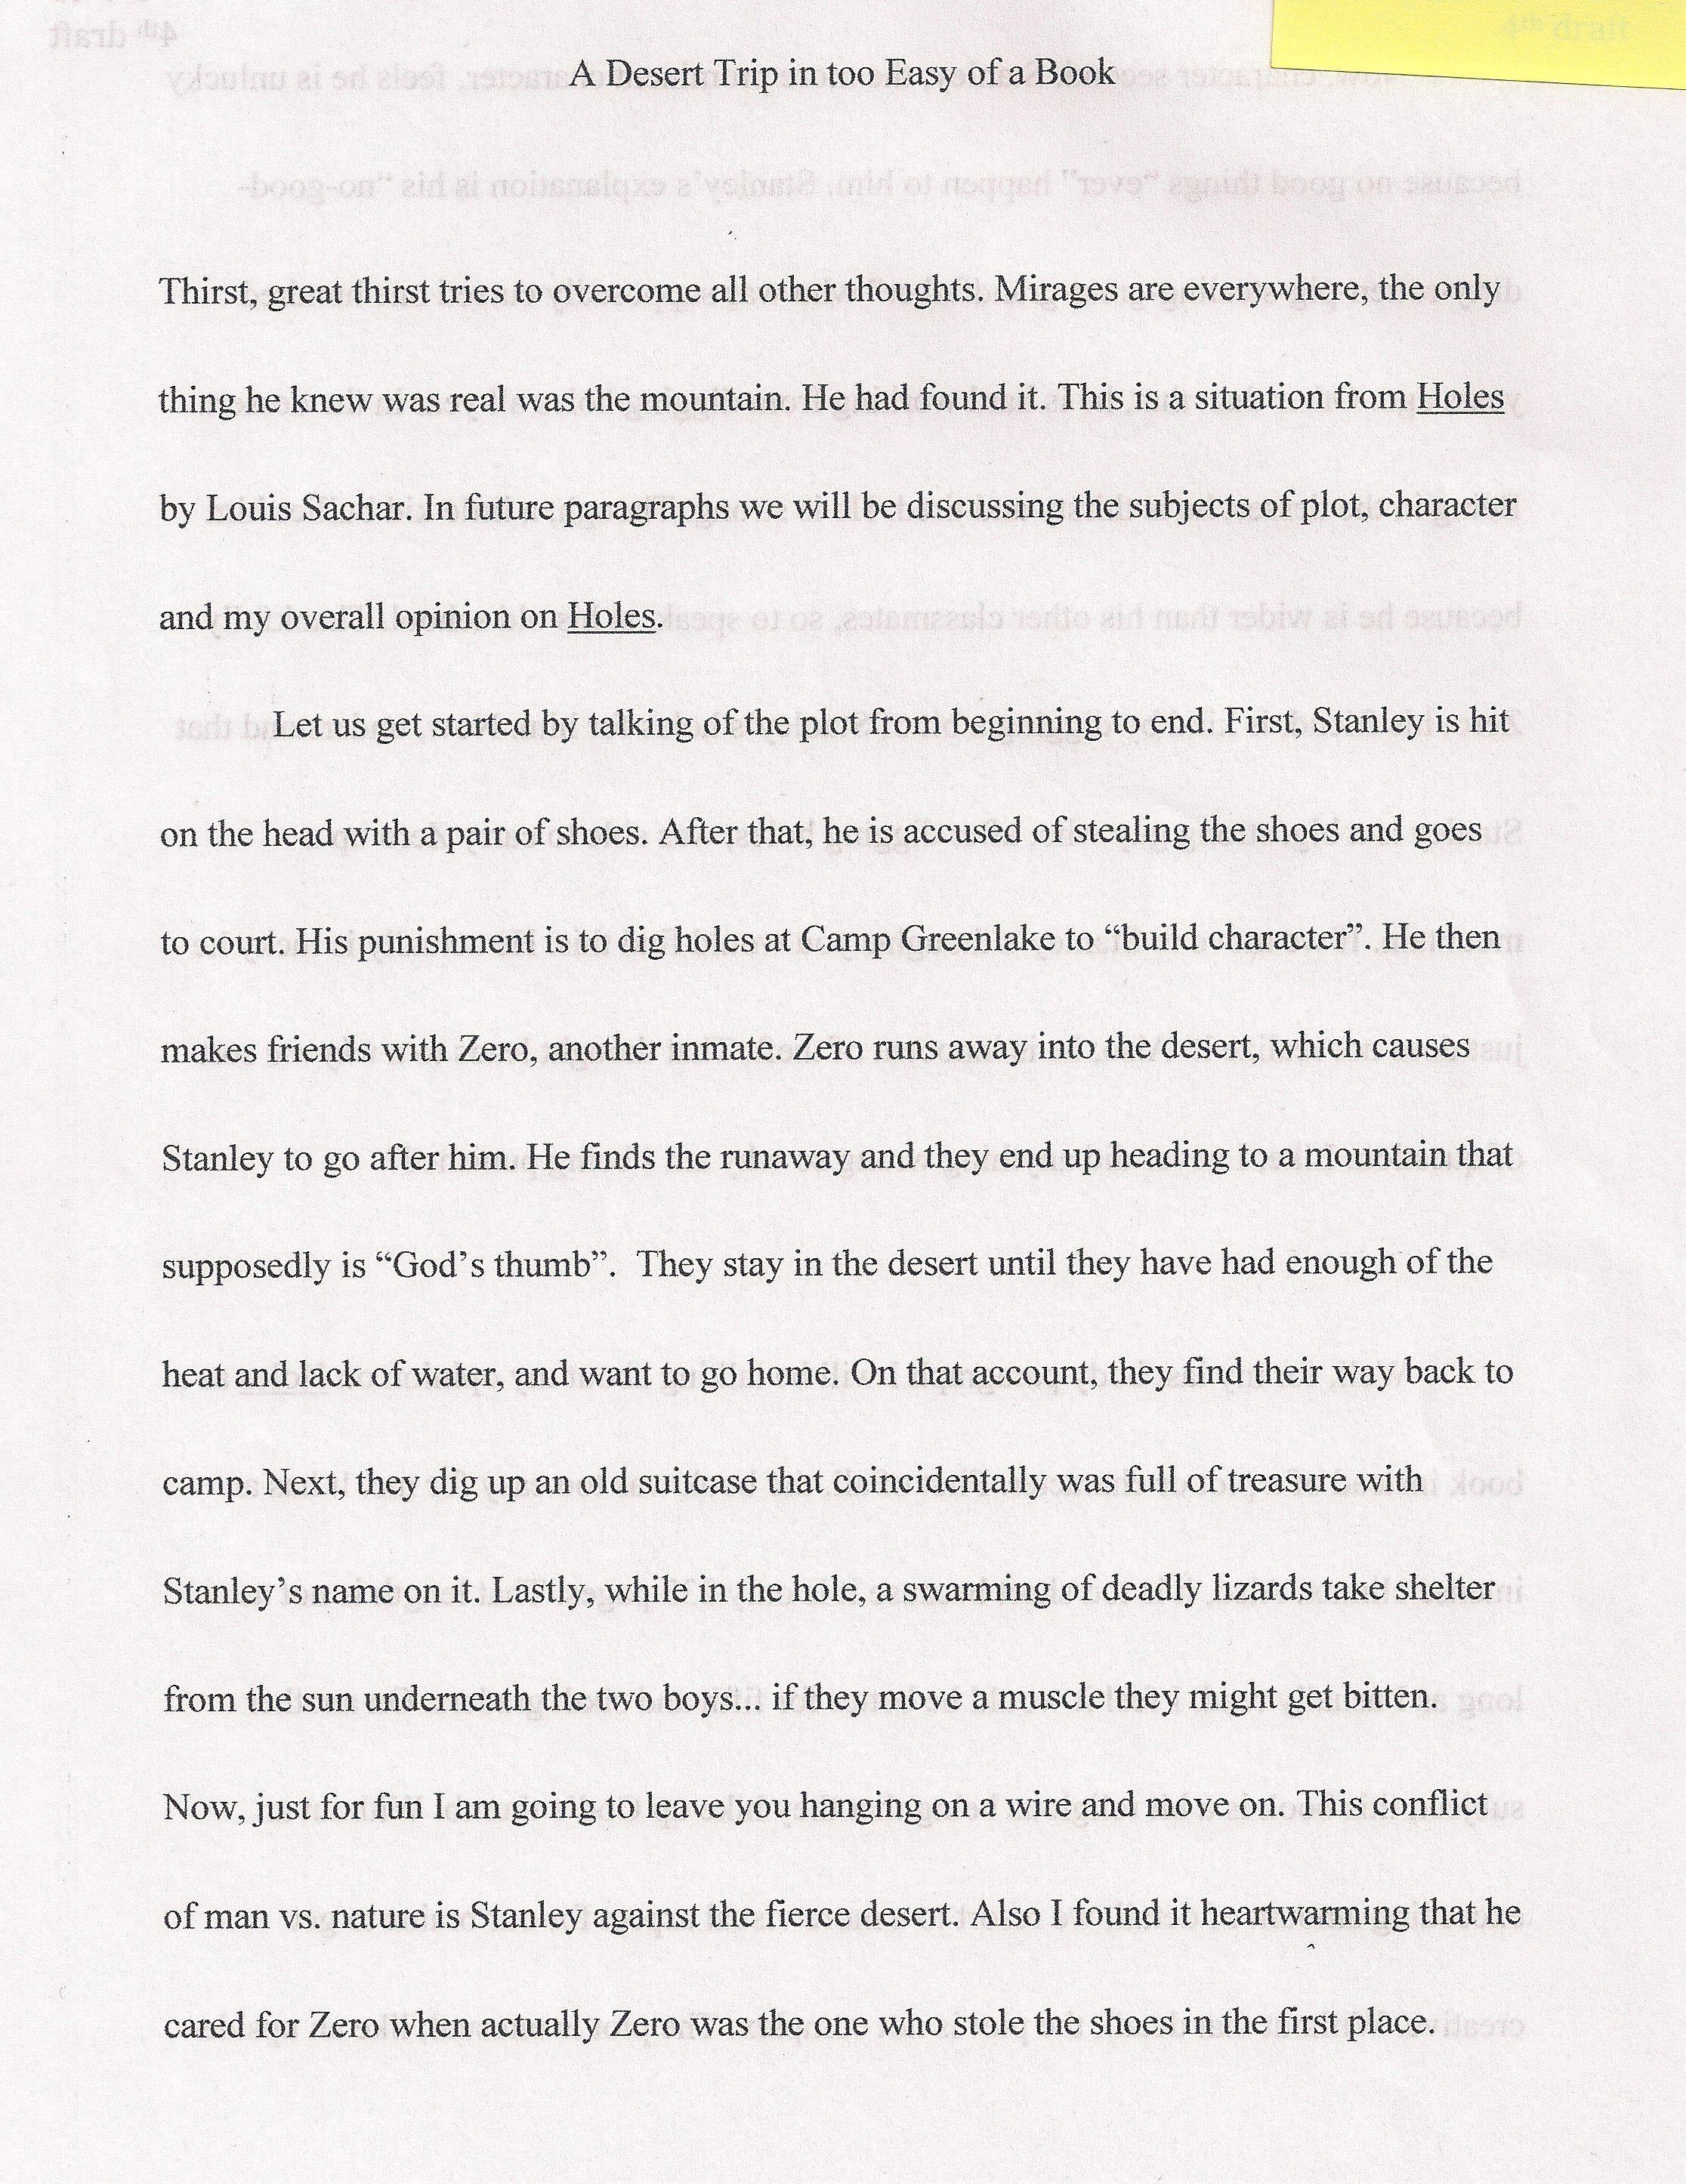 021 Argumentative Essay Topic Ideas Example Surprising For Middle School College Full